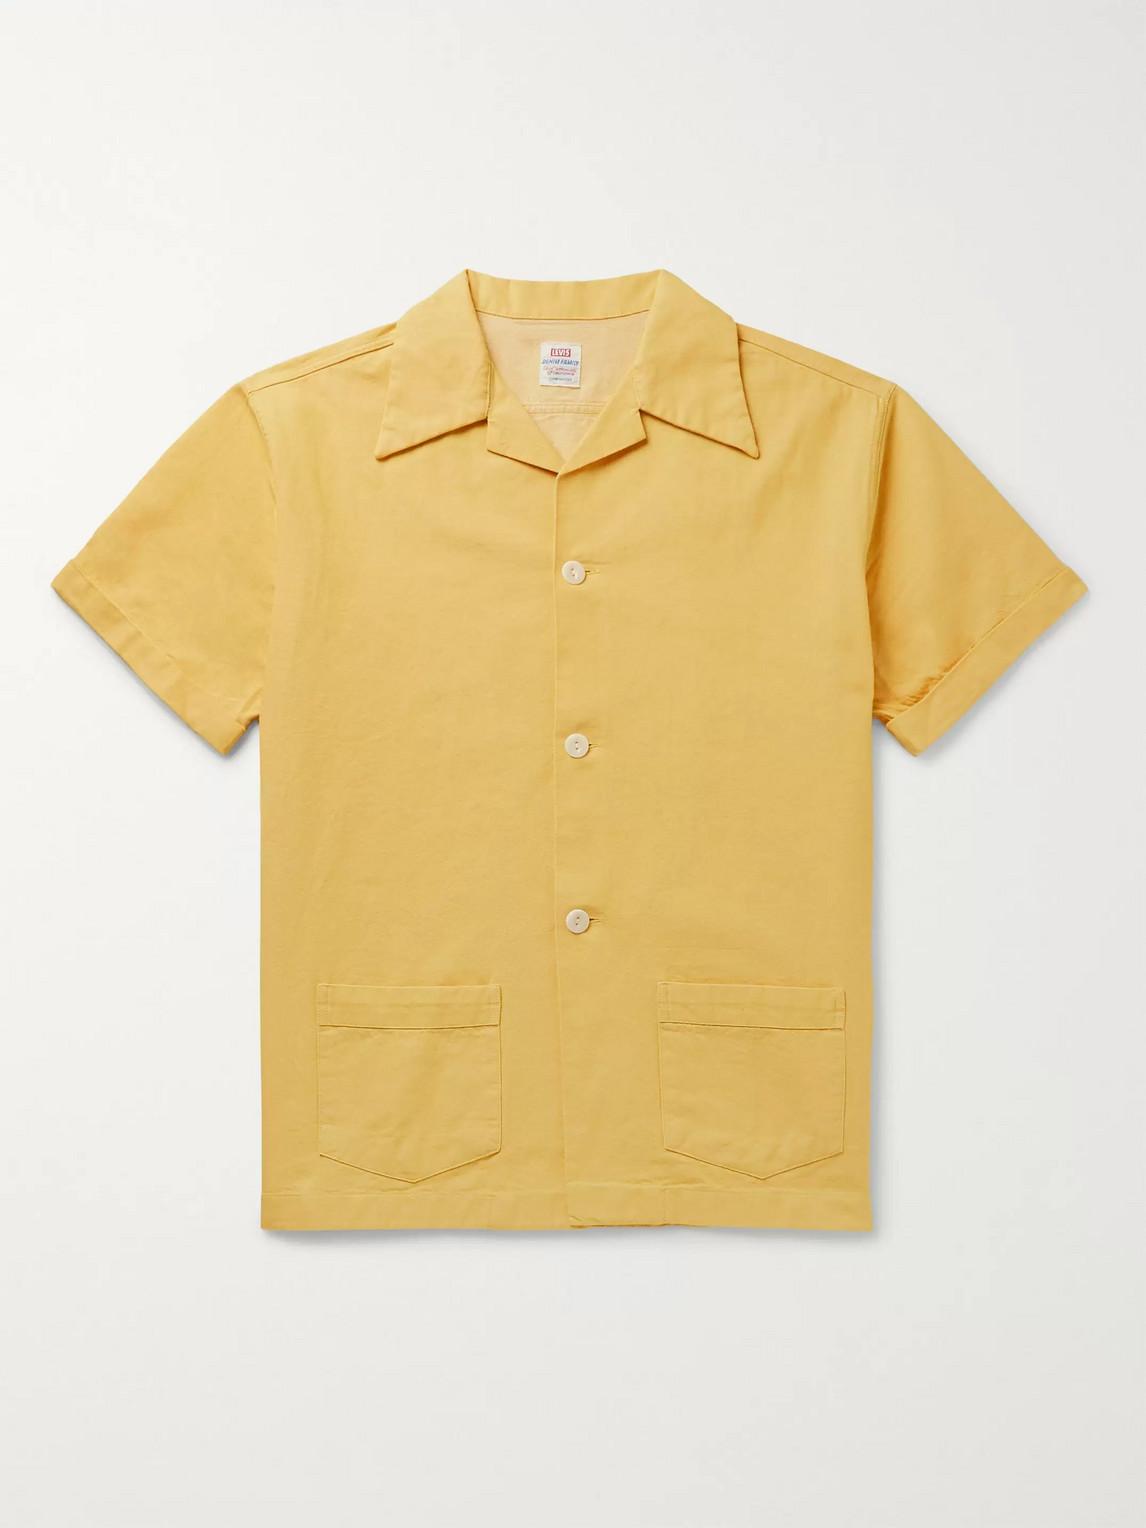 levi's vintage clothing - denim family camp-collar cotton shirt - men - yellow